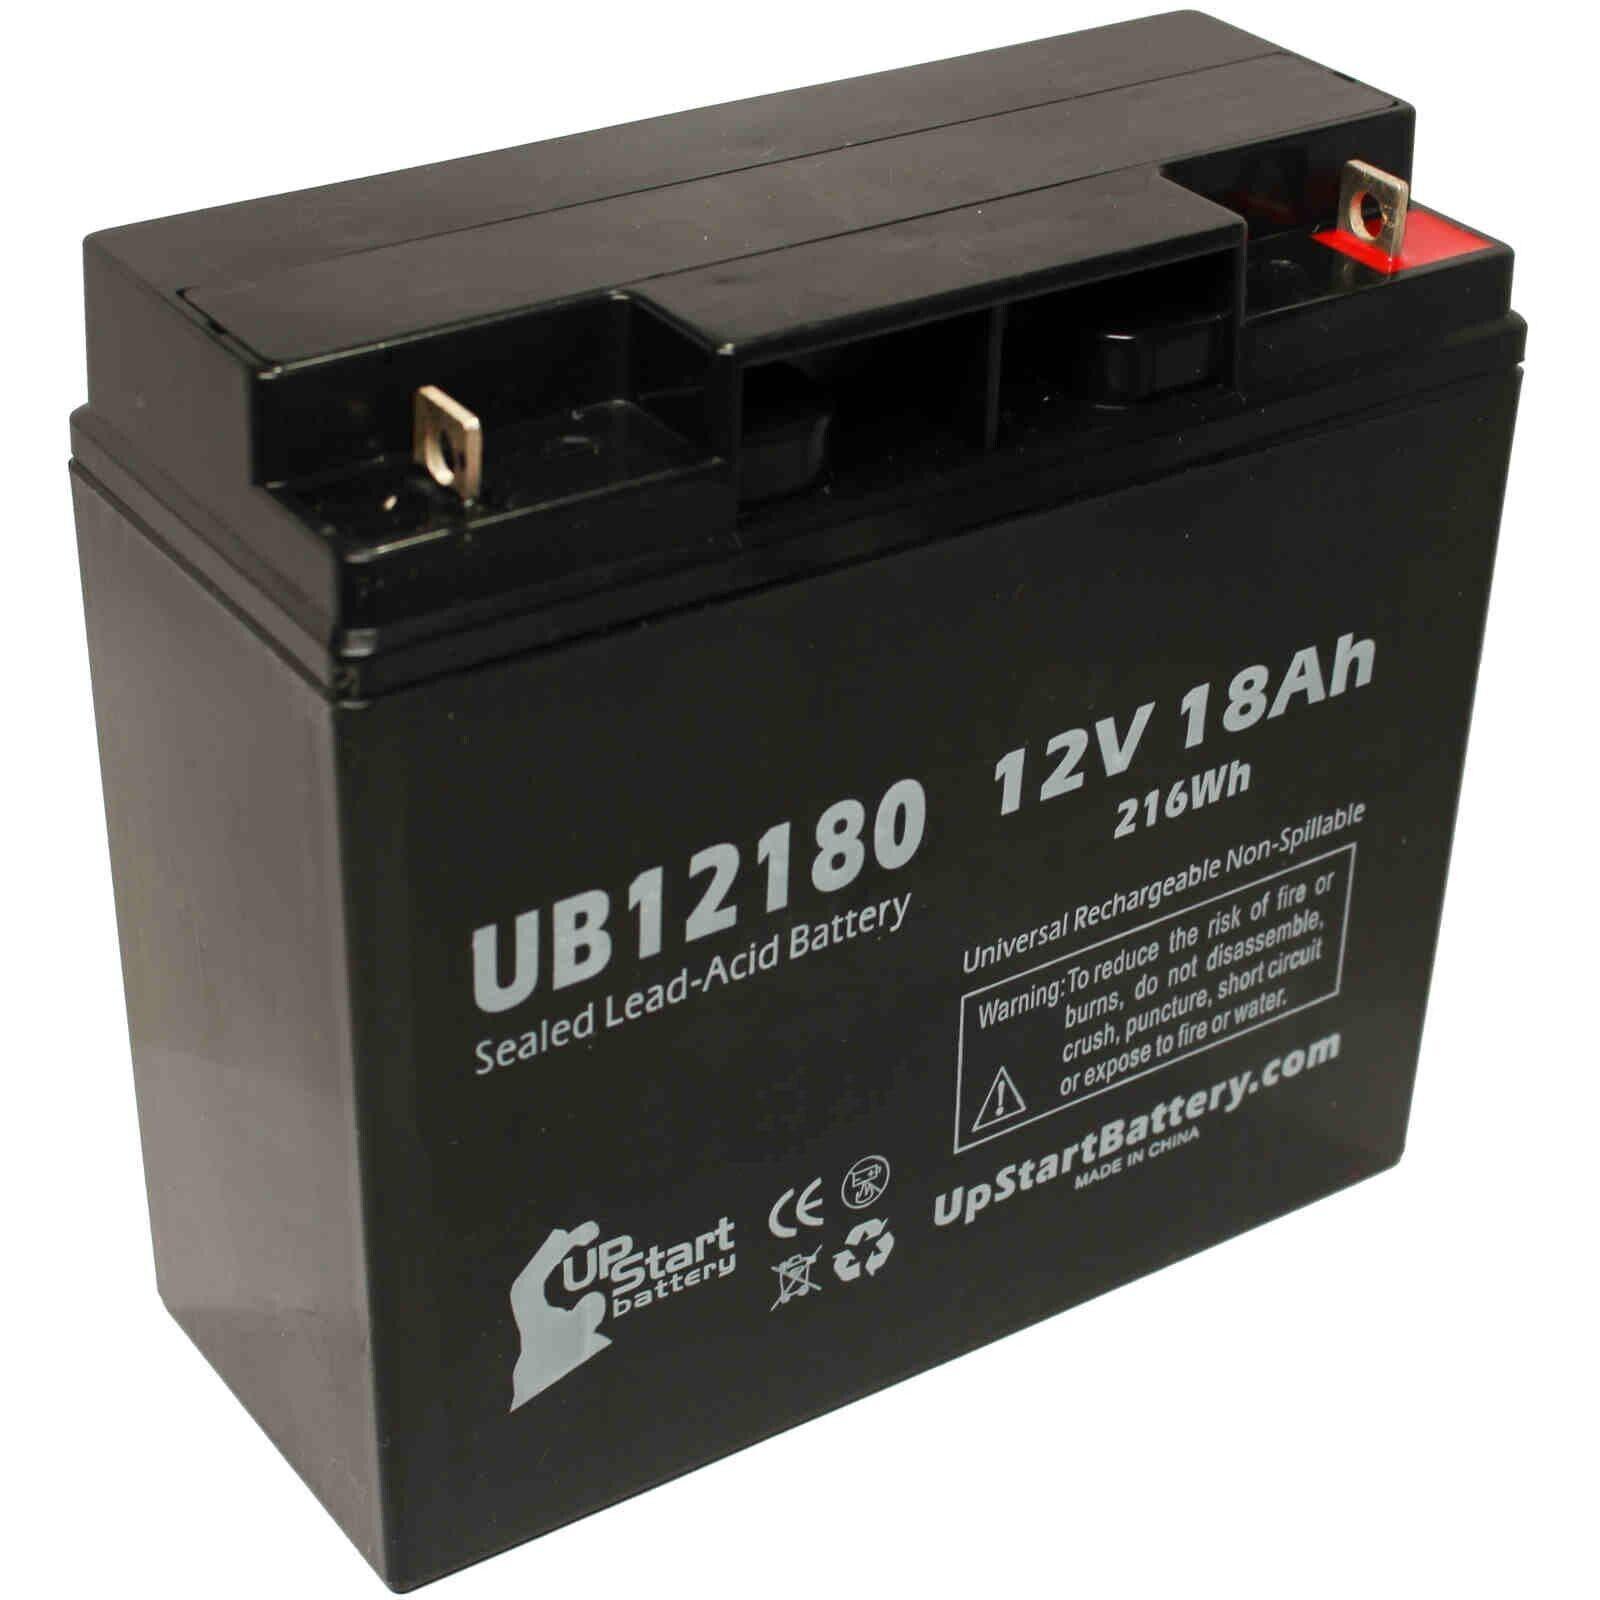 APC RBC7 1000 Battery UB12180 12V 18Ah Sealed Lead Acid SLA AGM